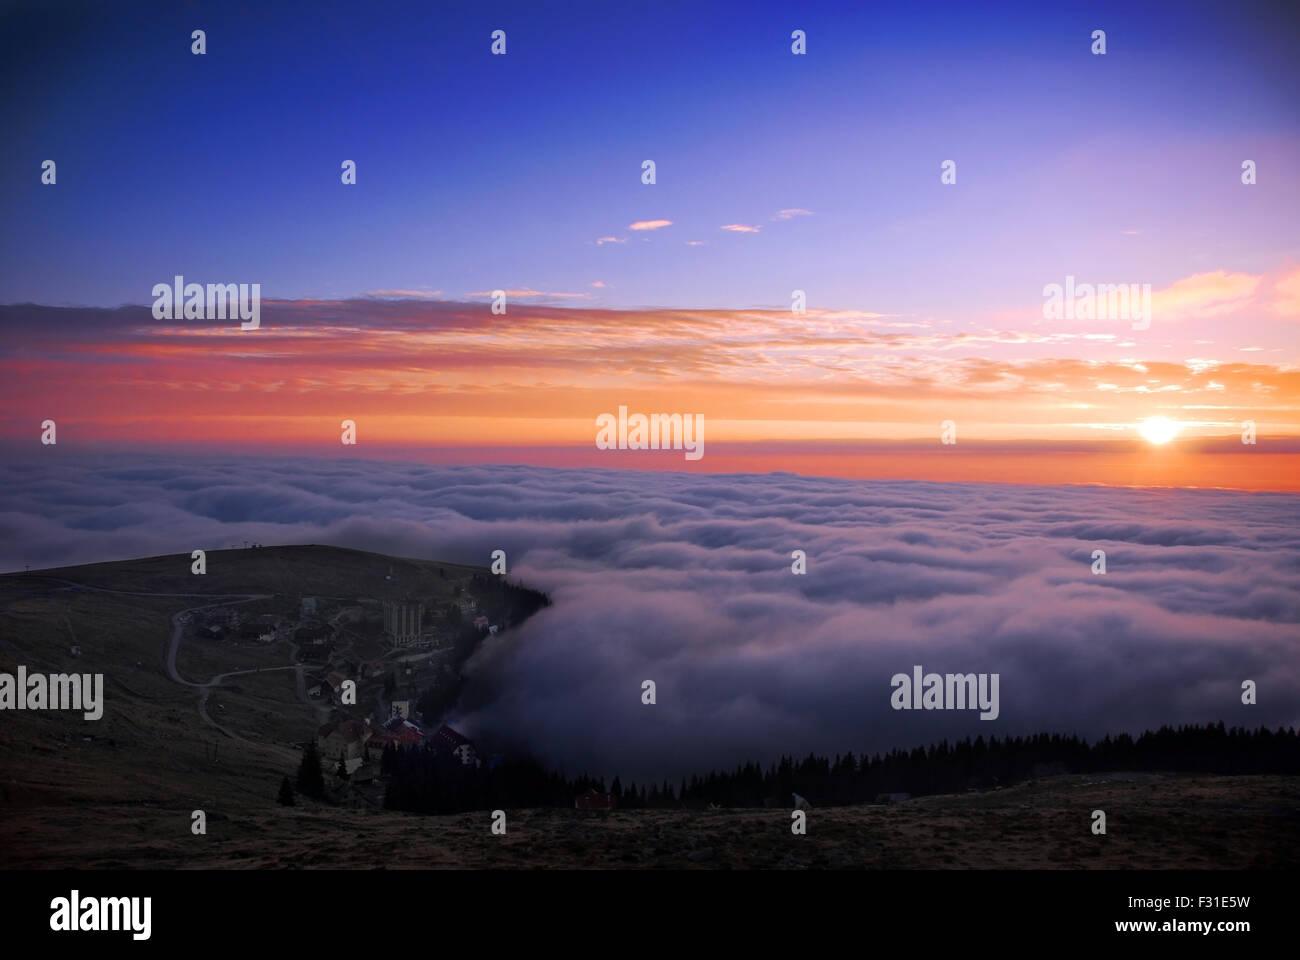 Mountain Top Sonnenuntergang über Wolken Stockbild